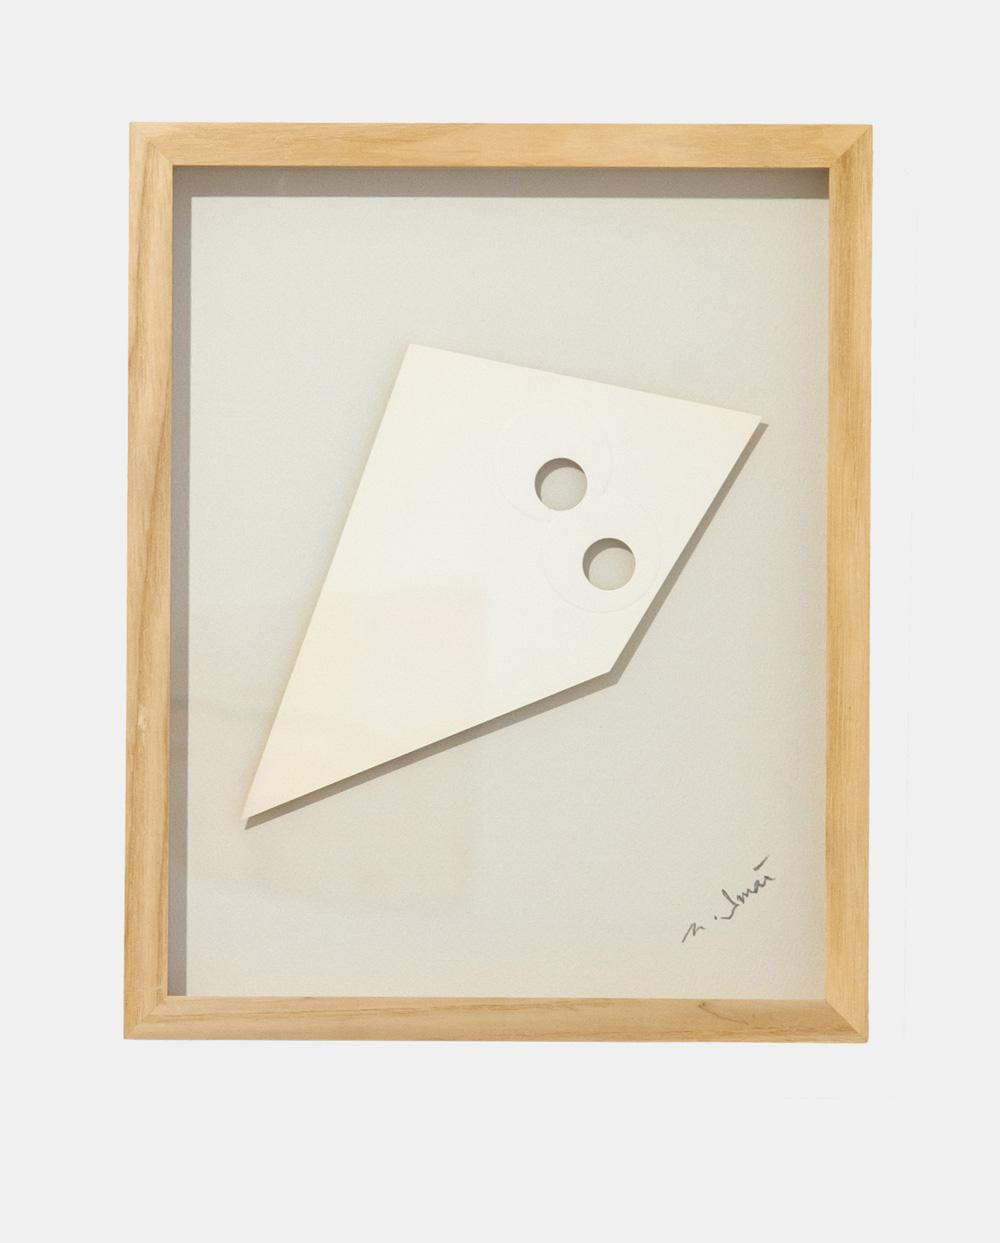 Norio Imai   White piece-B , 1966  emboss, punching, paper  31.9cm x 25.9cm × 3.3cm (frame)